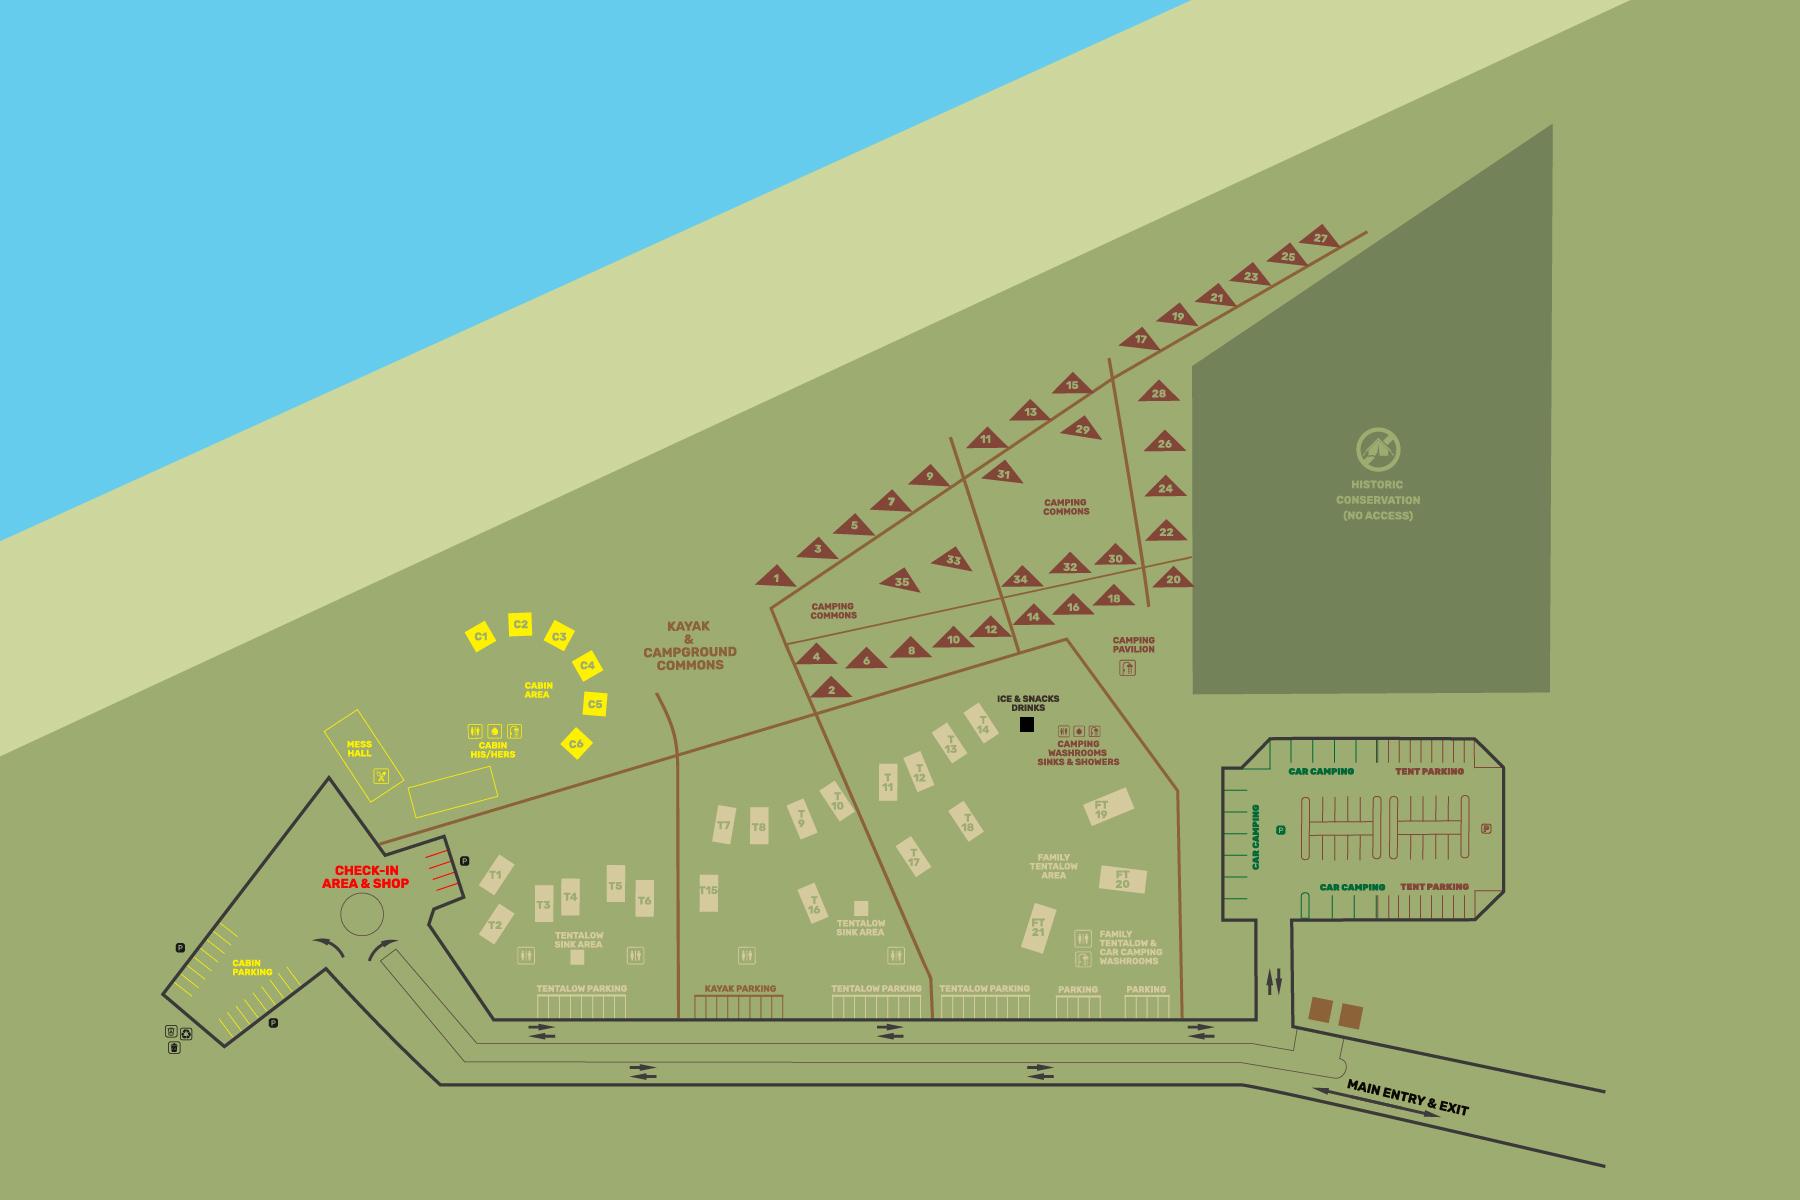 Camp Olowalu Campground